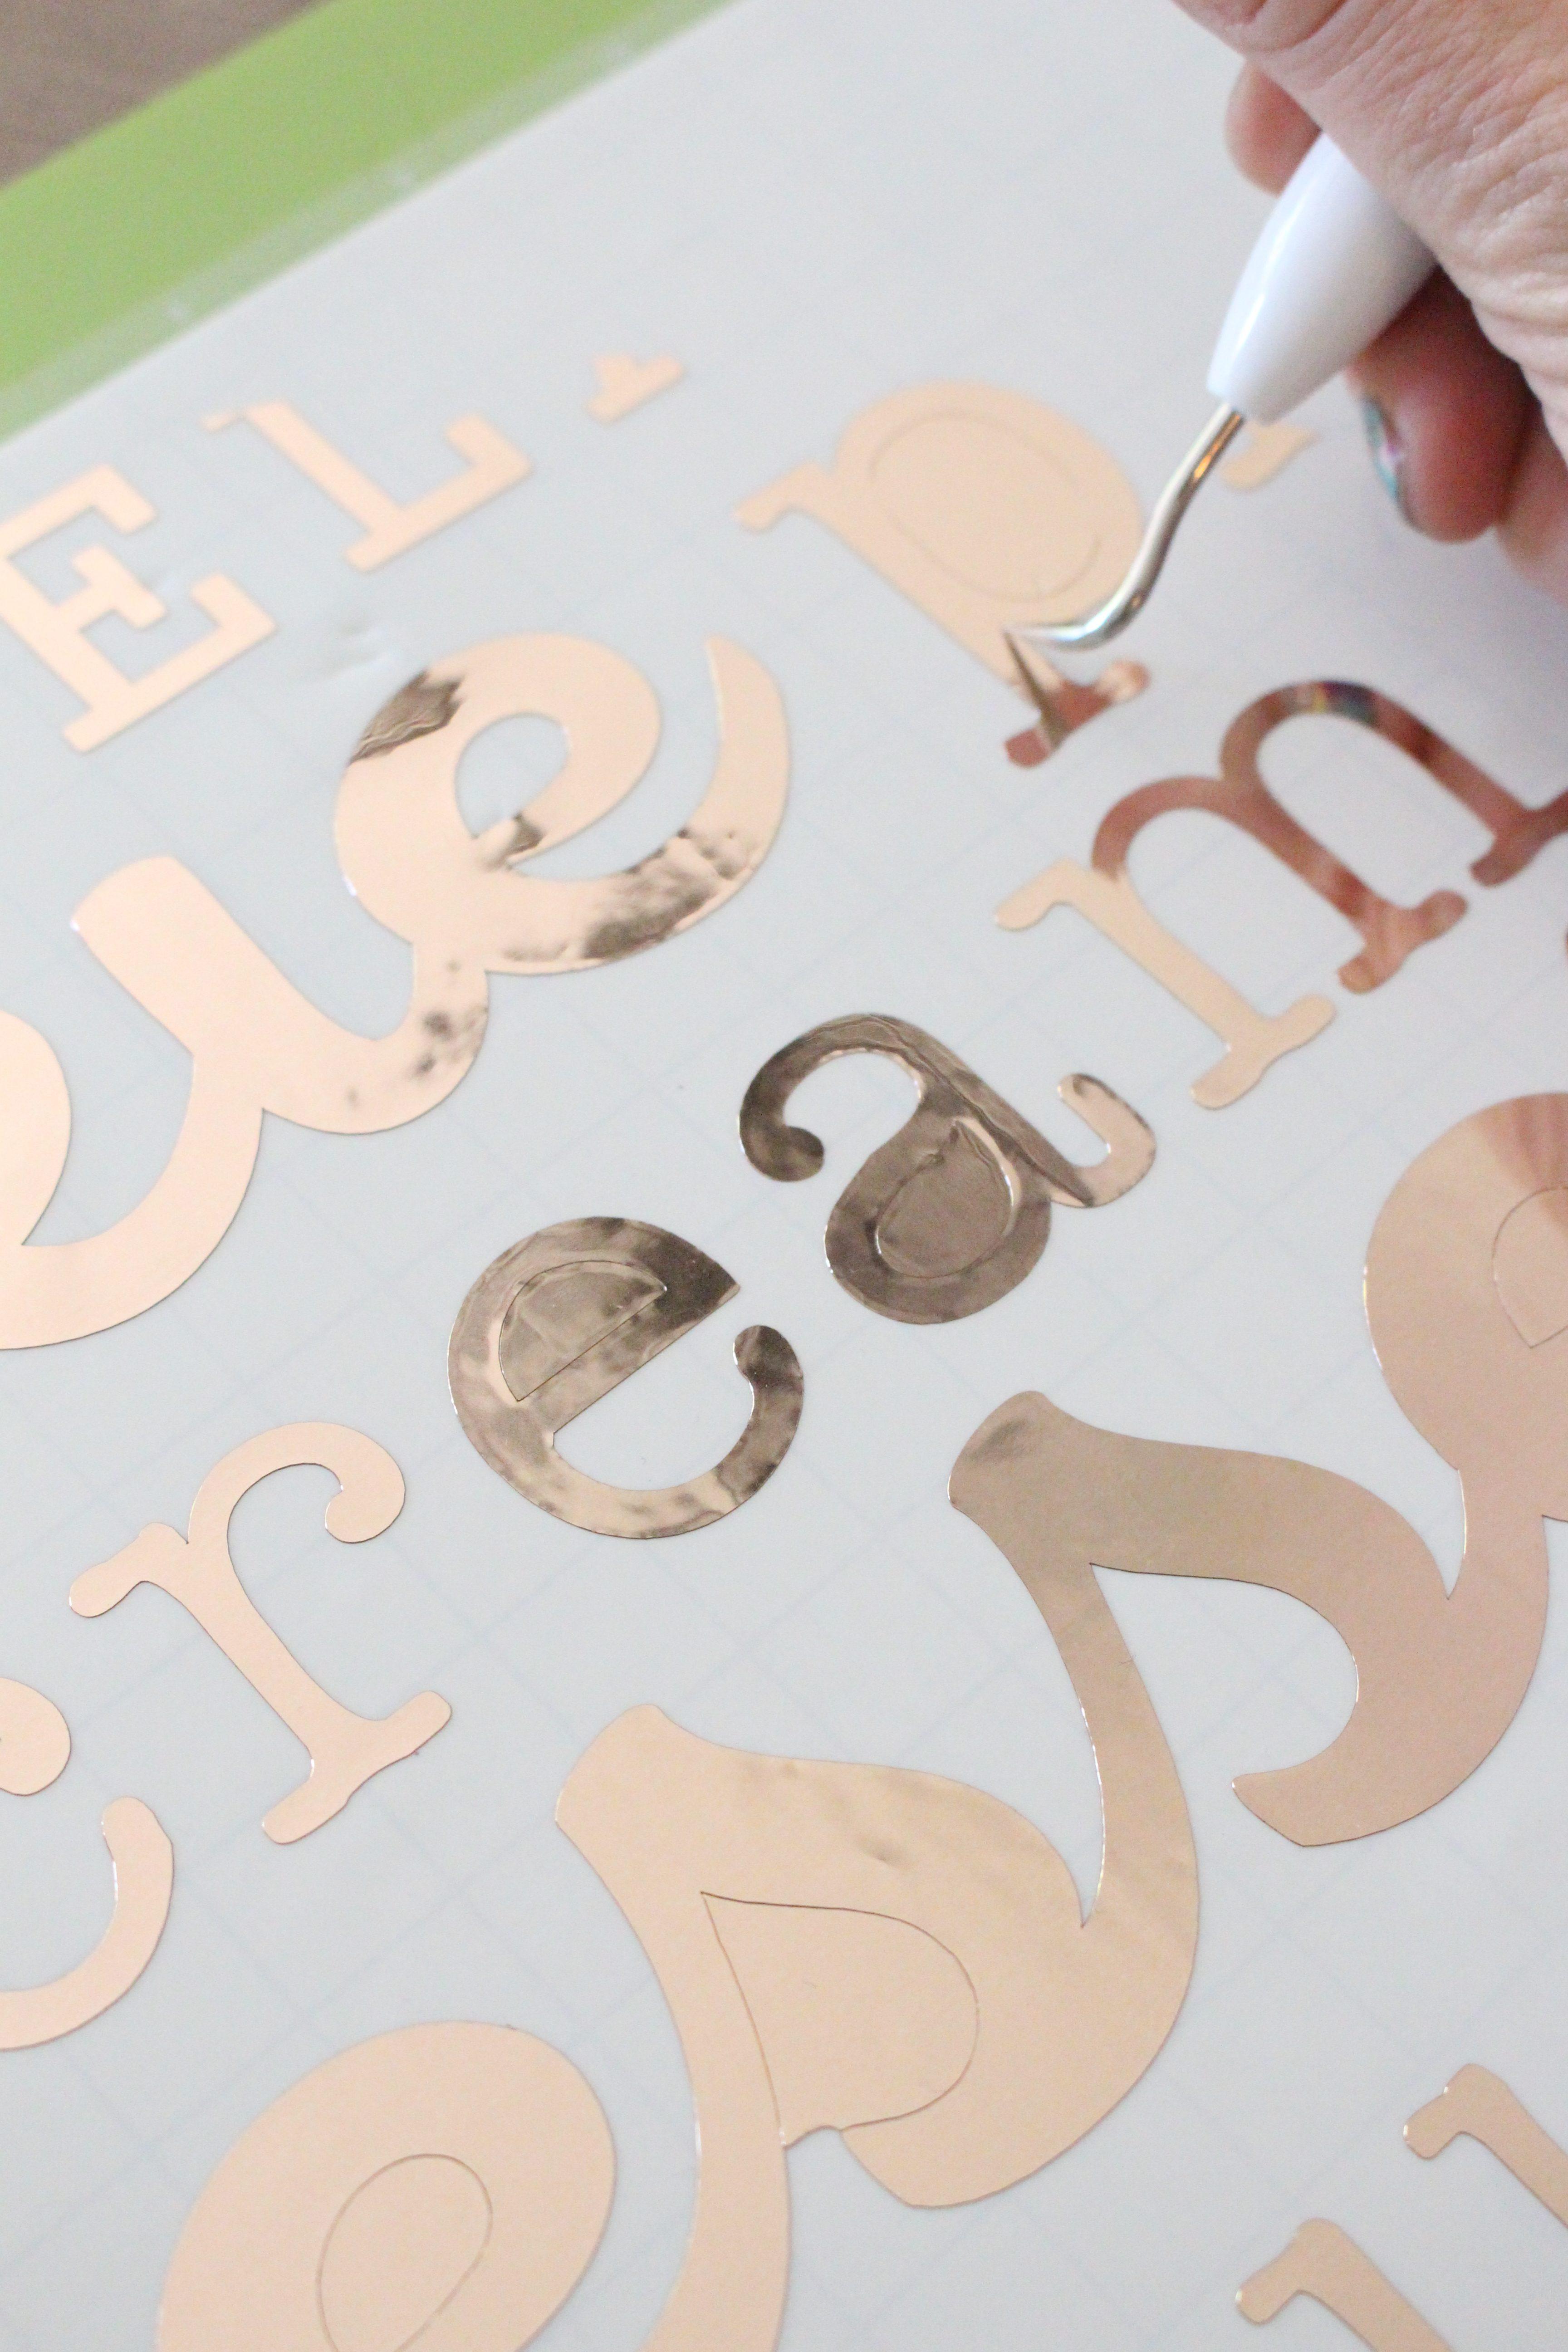 Cricut Explore Air 2- cutting machine- DIY- crafting machine- Cricut- using a writing and cutting machine for crafts- vinyl crafts- cutting vinyl- using the Cricut for vinyl projects- copper vinyl- cake stand decor